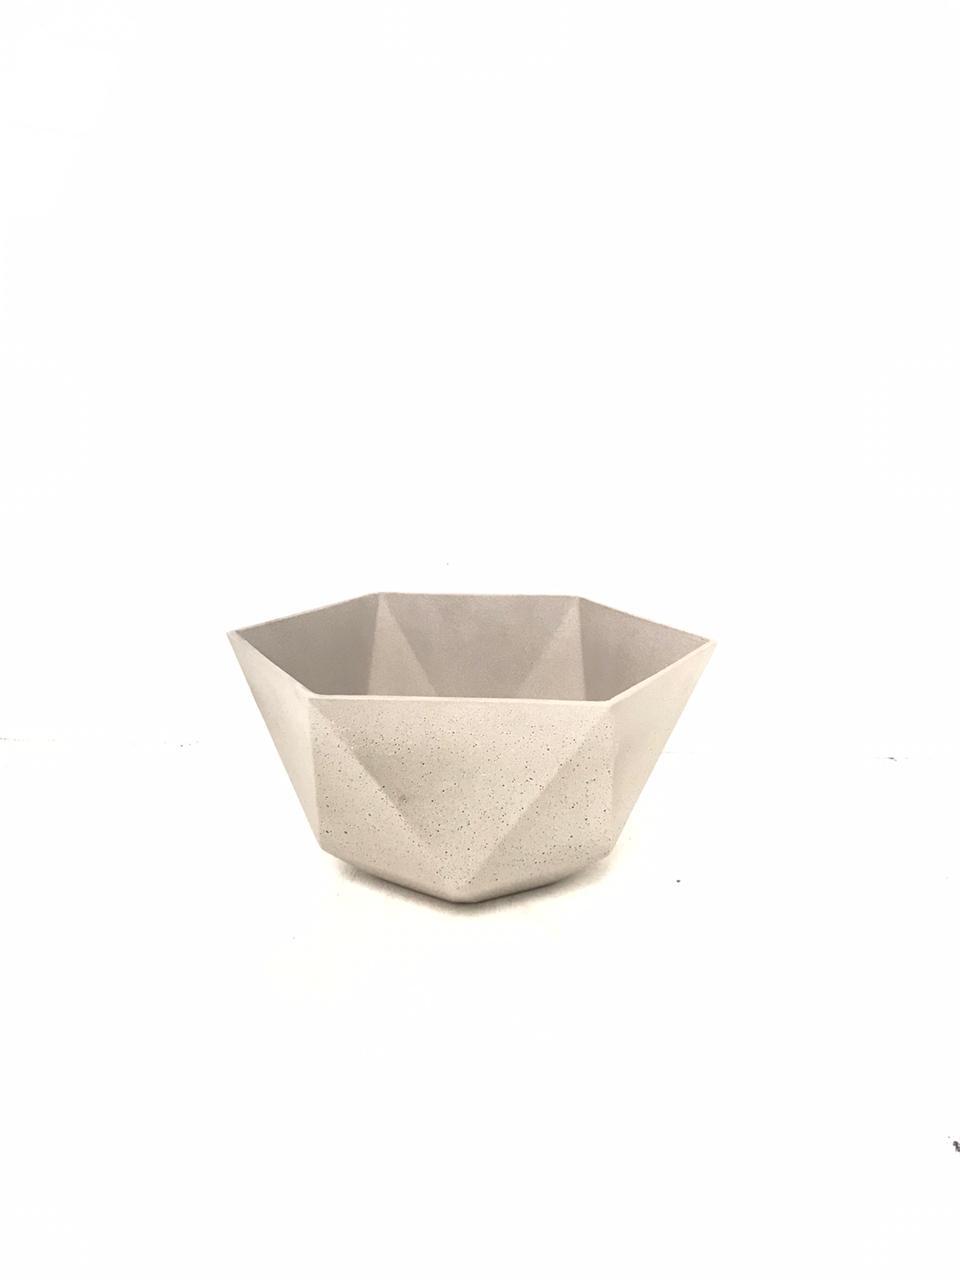 Sandstone Pot Hex Cement Small Pots & Vases